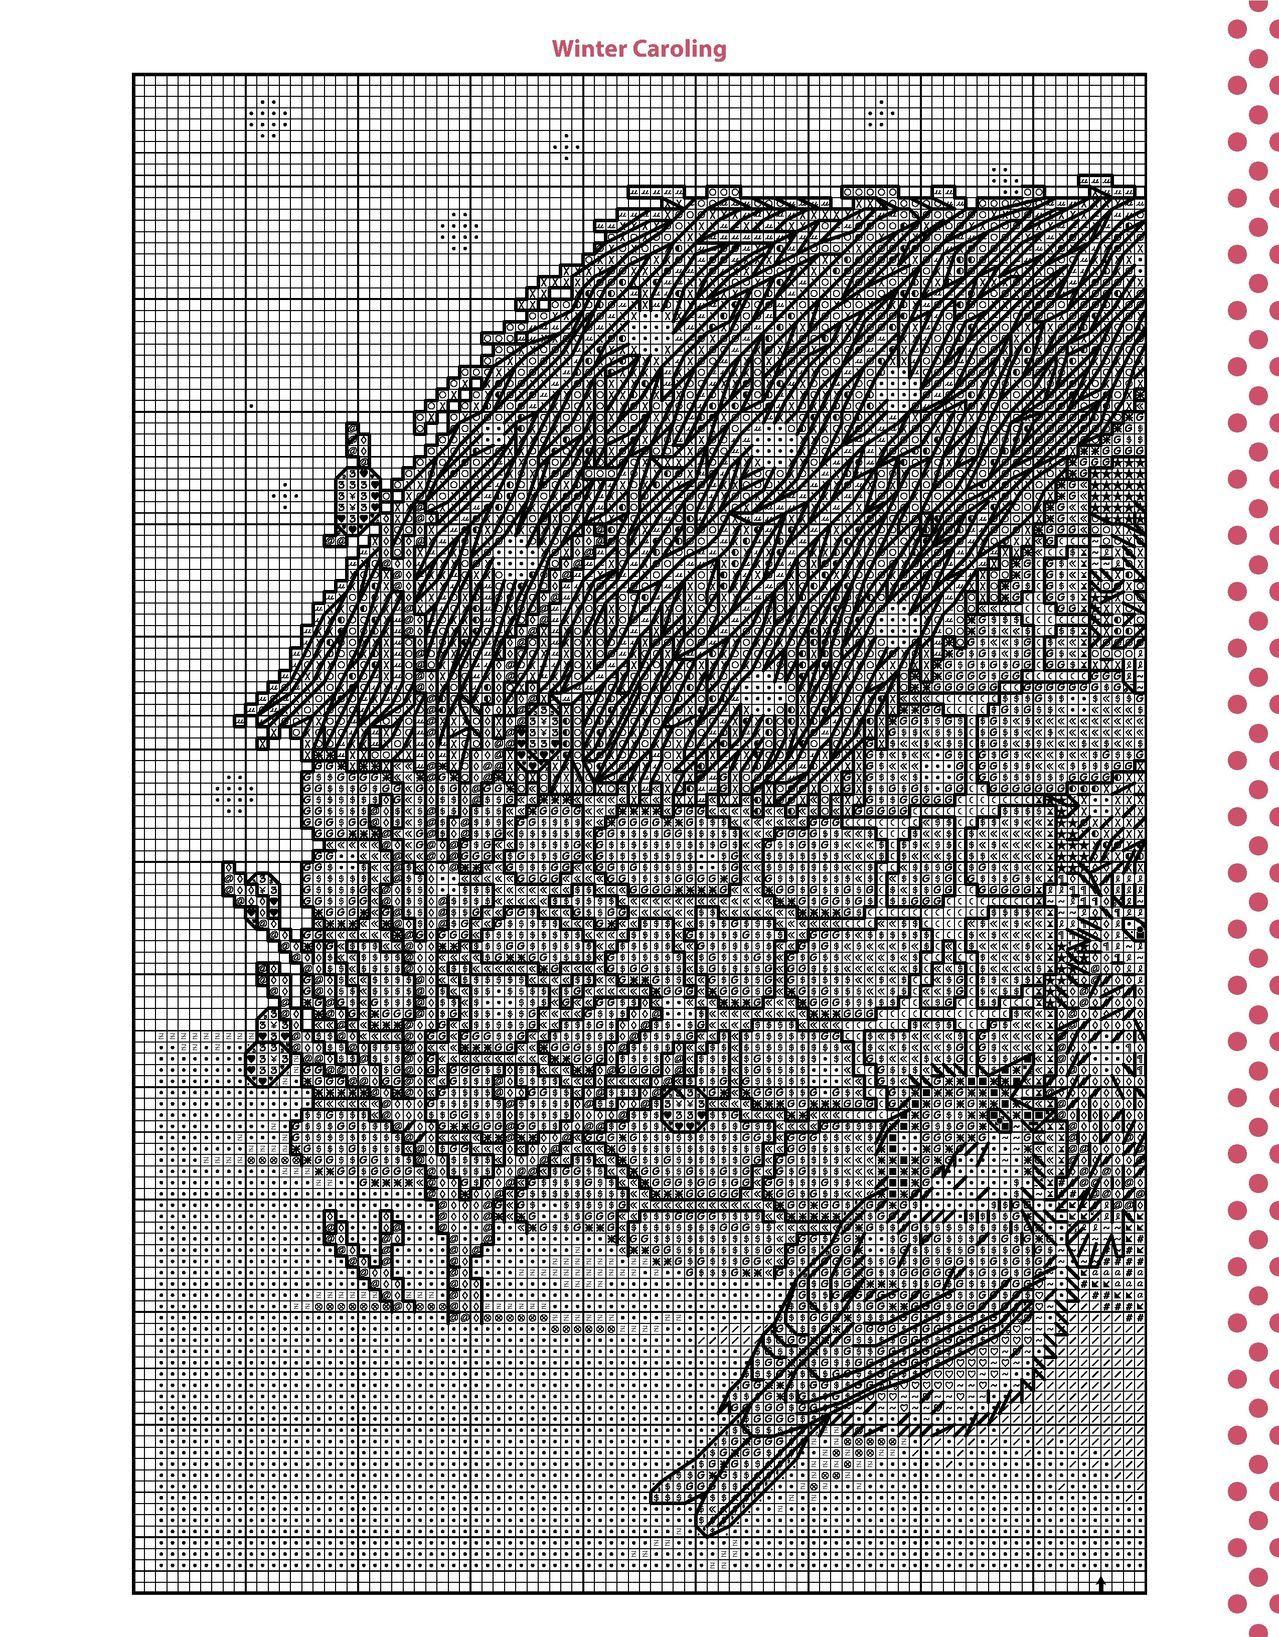 Cross stitch winter caroling part 2 color chart on part 1 cross stitch winter caroling part 2 color chart on part 1 nvjuhfo Choice Image